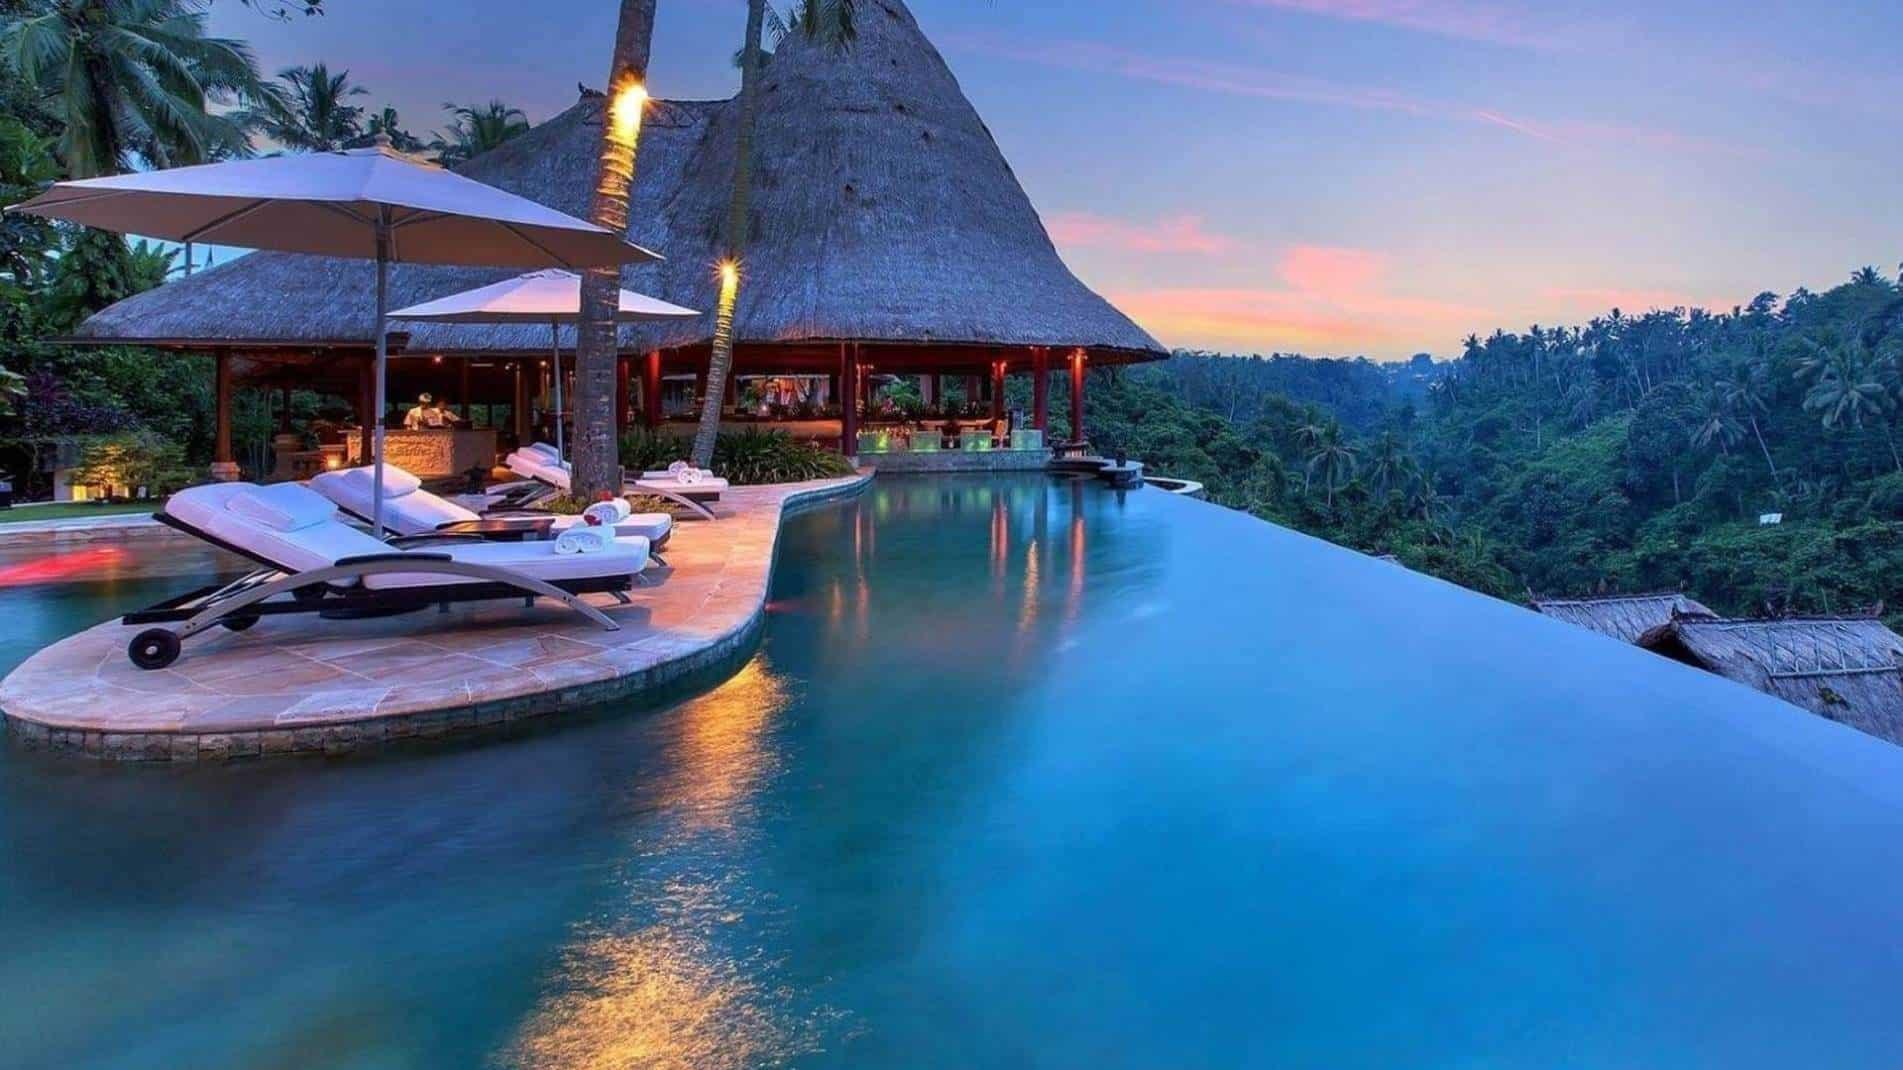 Viceroy-Resort-Ubud-Bali-4